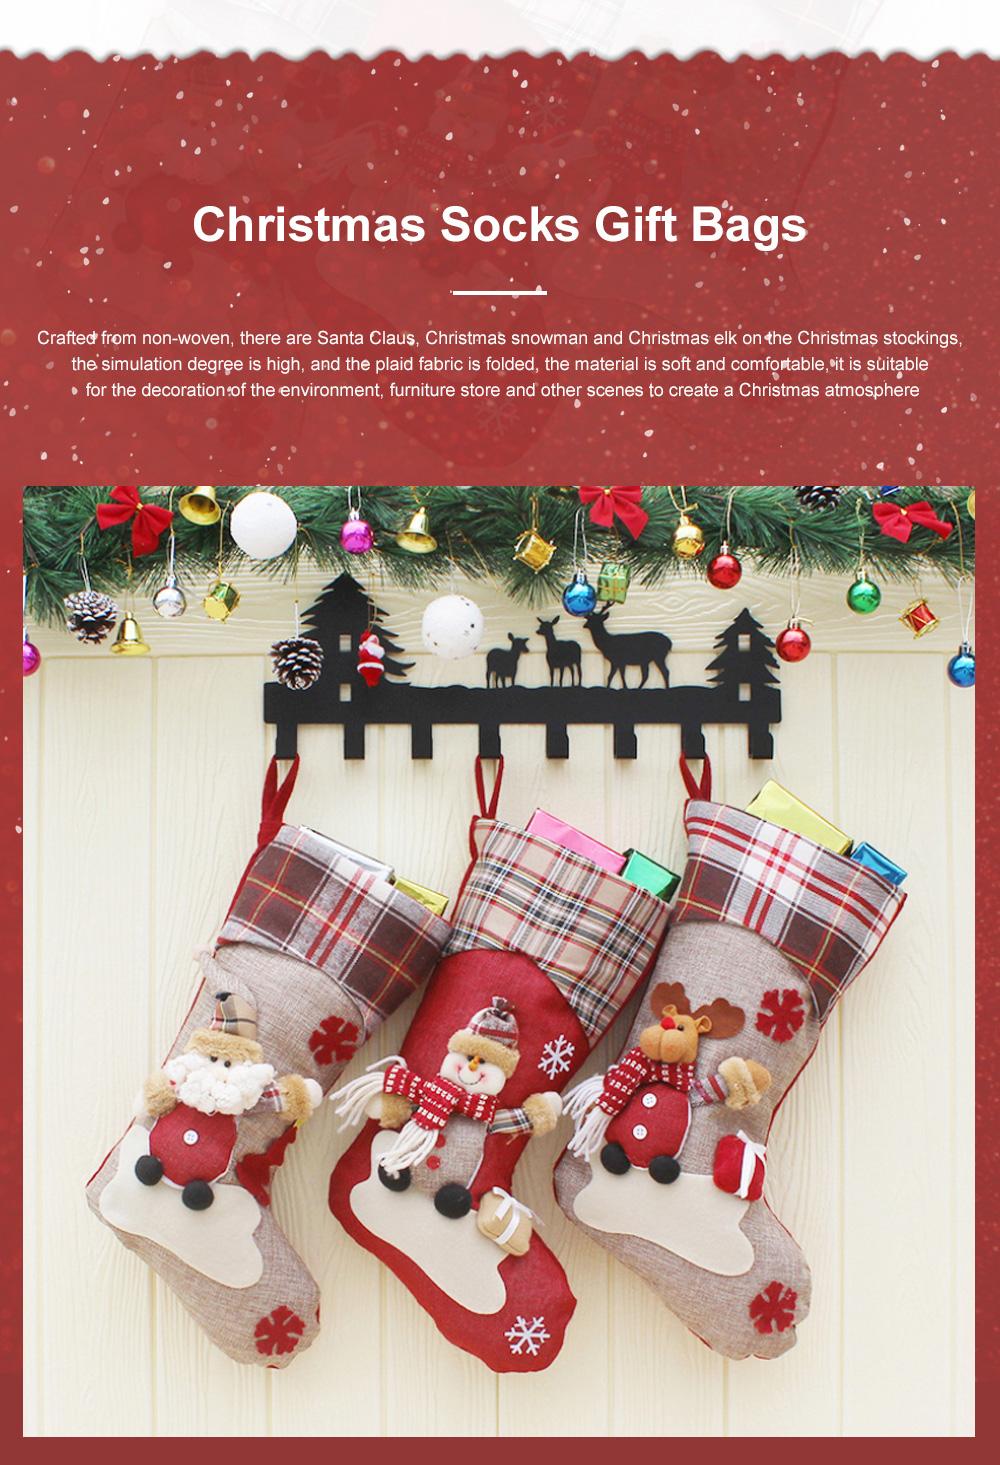 Christmas Decorations Santa Claus Snowman Socks High Quality Christmas Socks Christmas Gift Bags Decorative Gift Bags 0